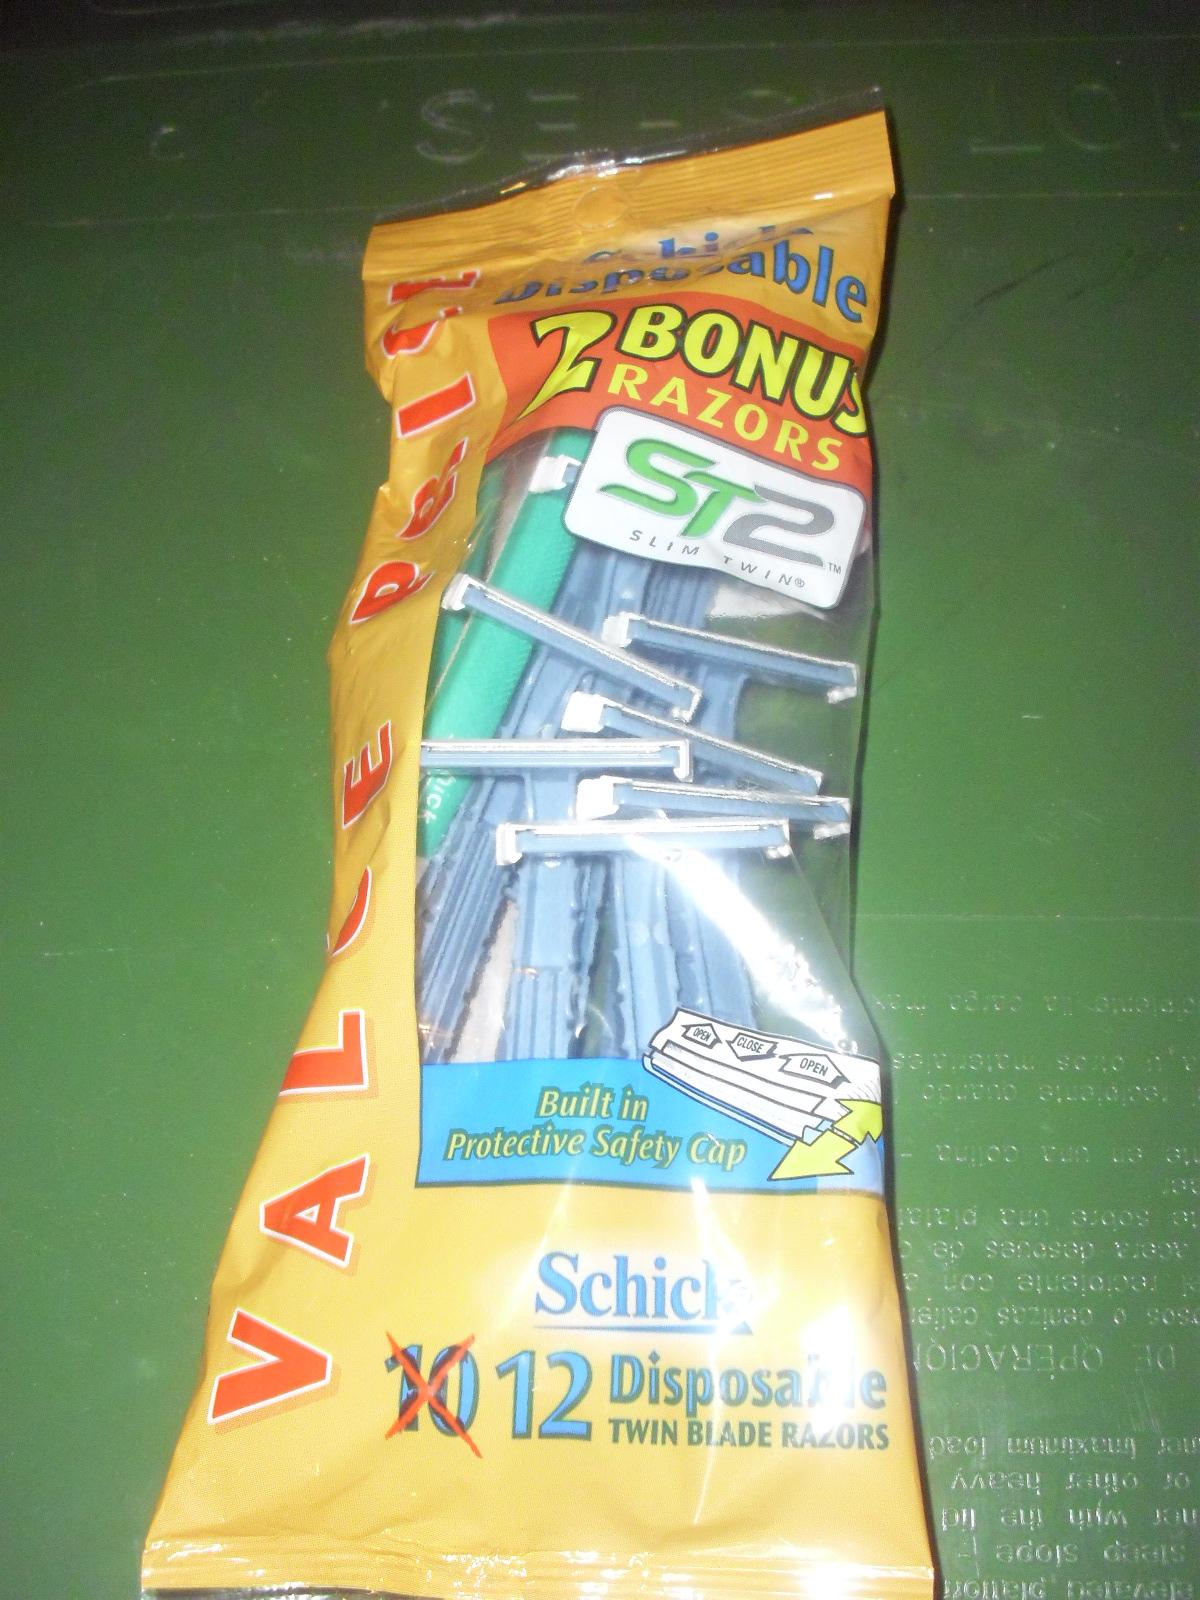 schick-disposable-razor.jpg